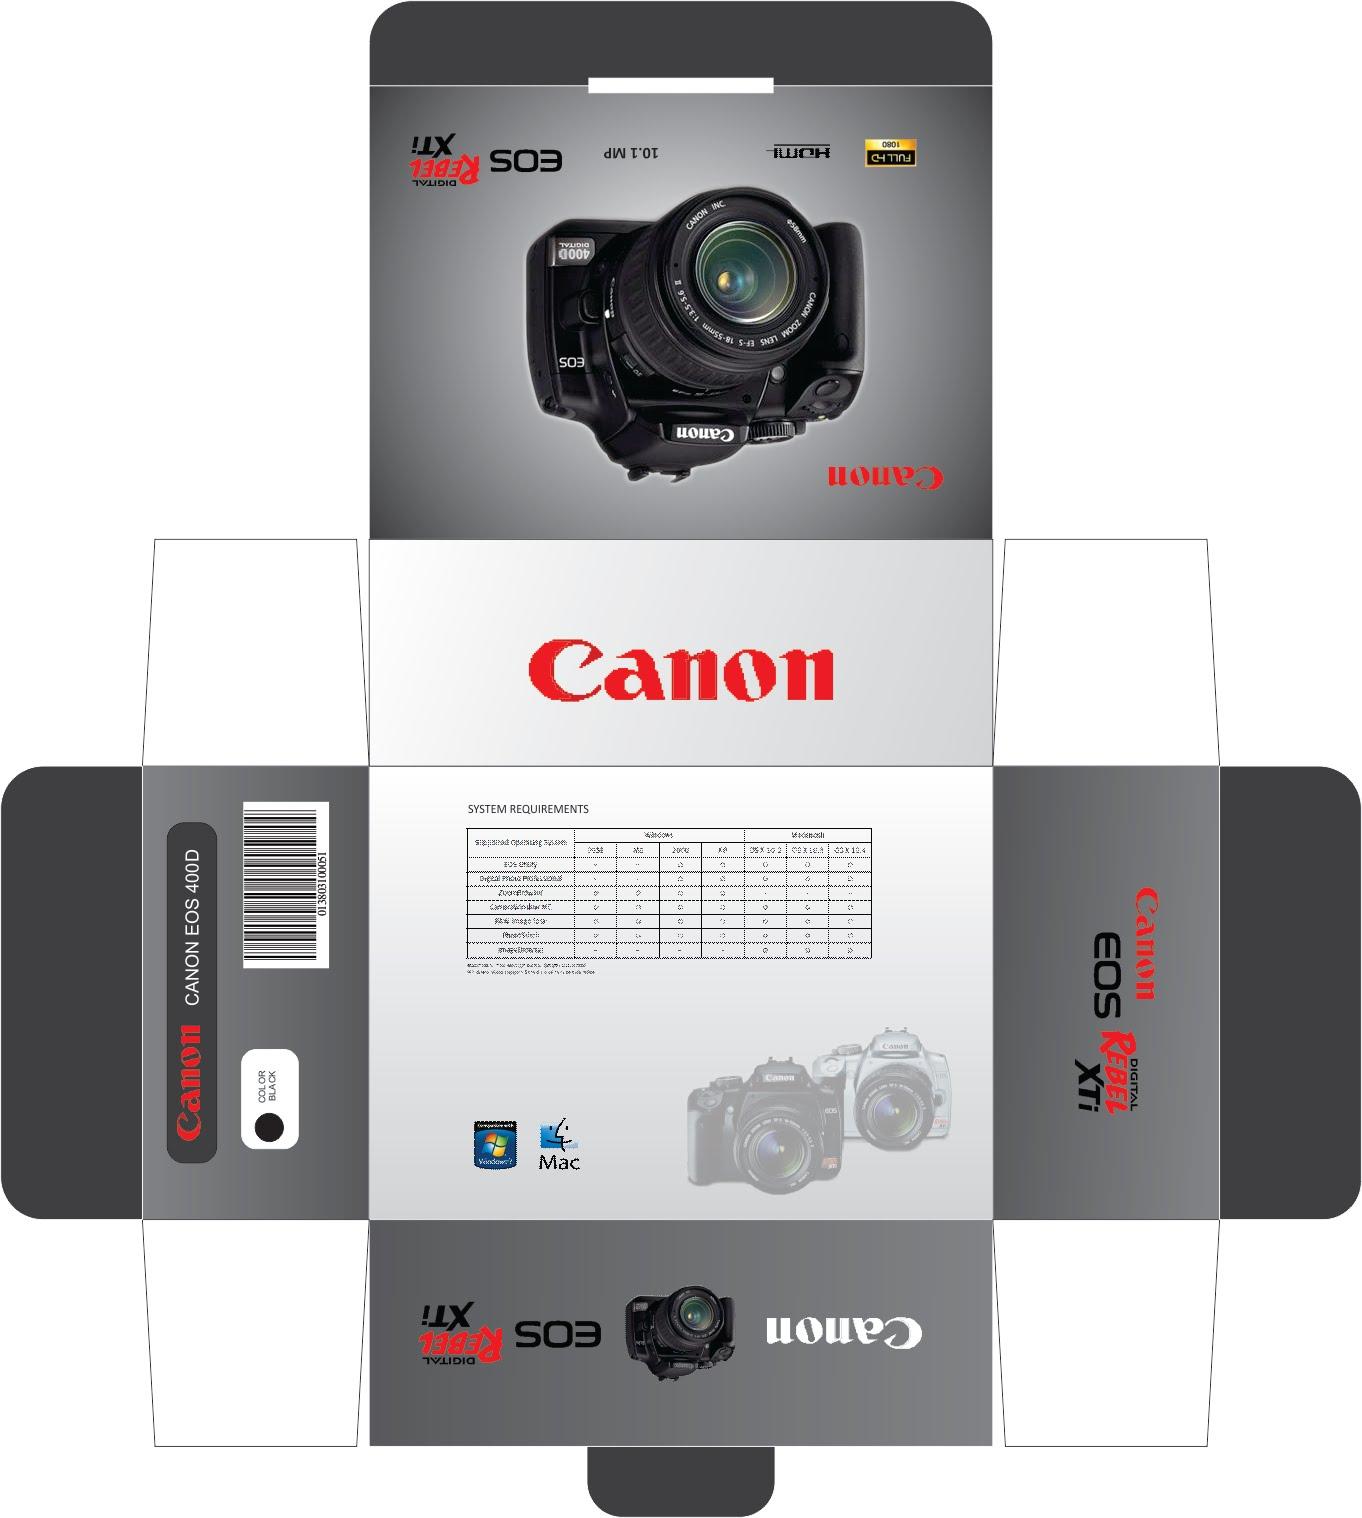 My Creative Juice: Print Designs - Canon EOS 400D